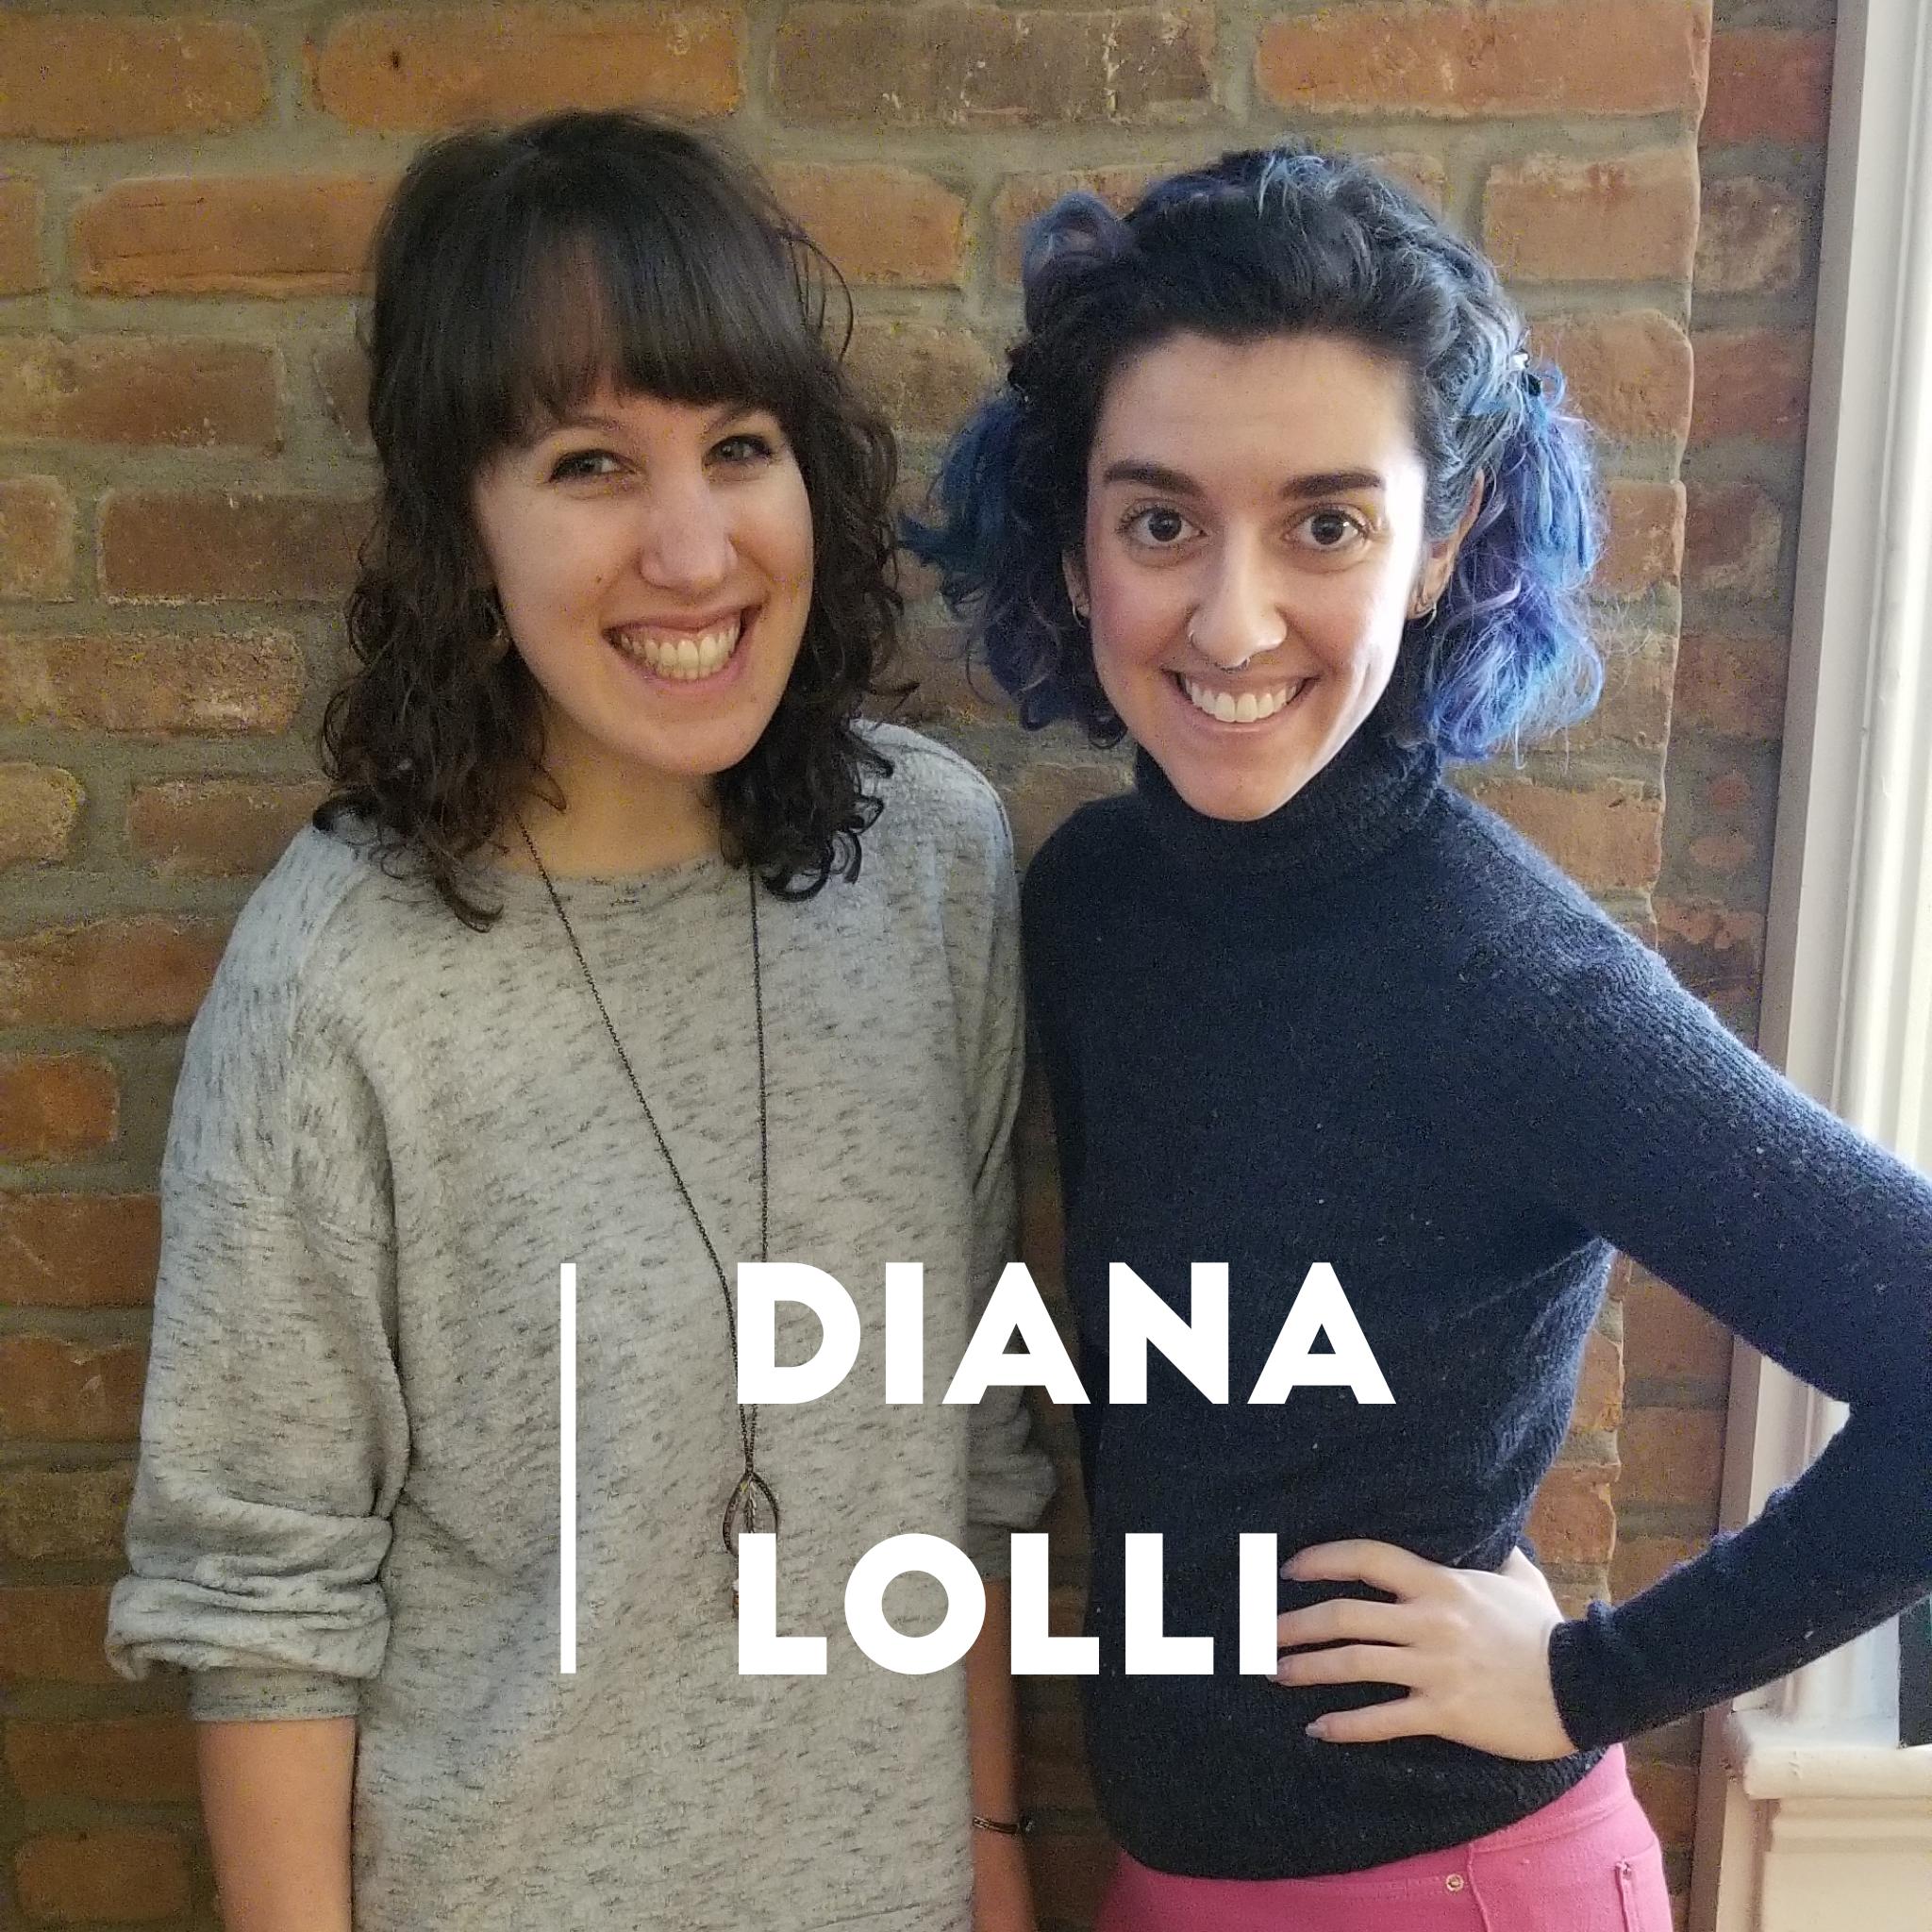 S2E10-Diana-Lolli.png